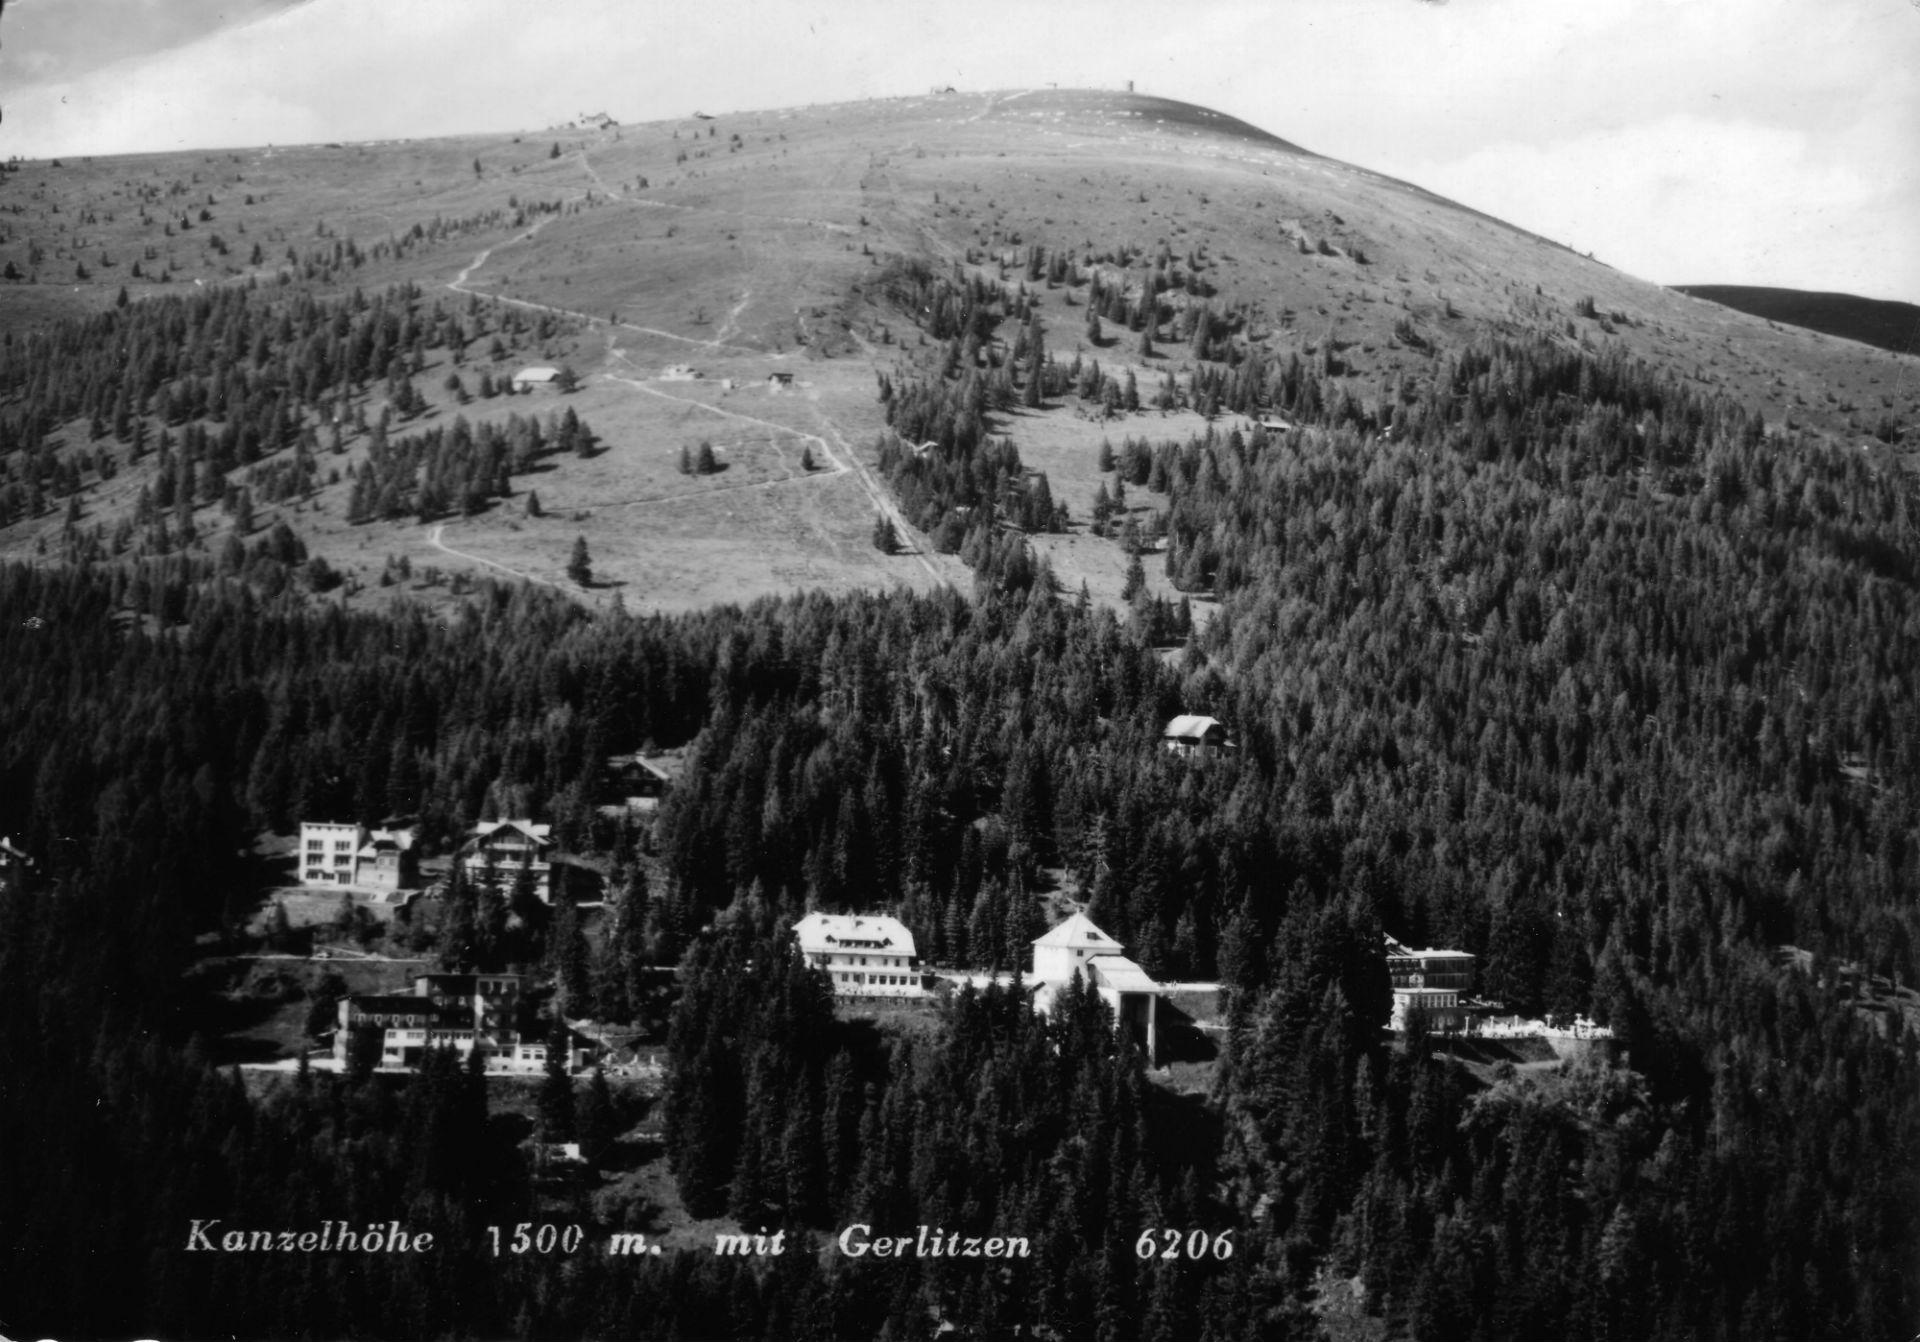 14-KanzelhöheZaubek1964.jpg